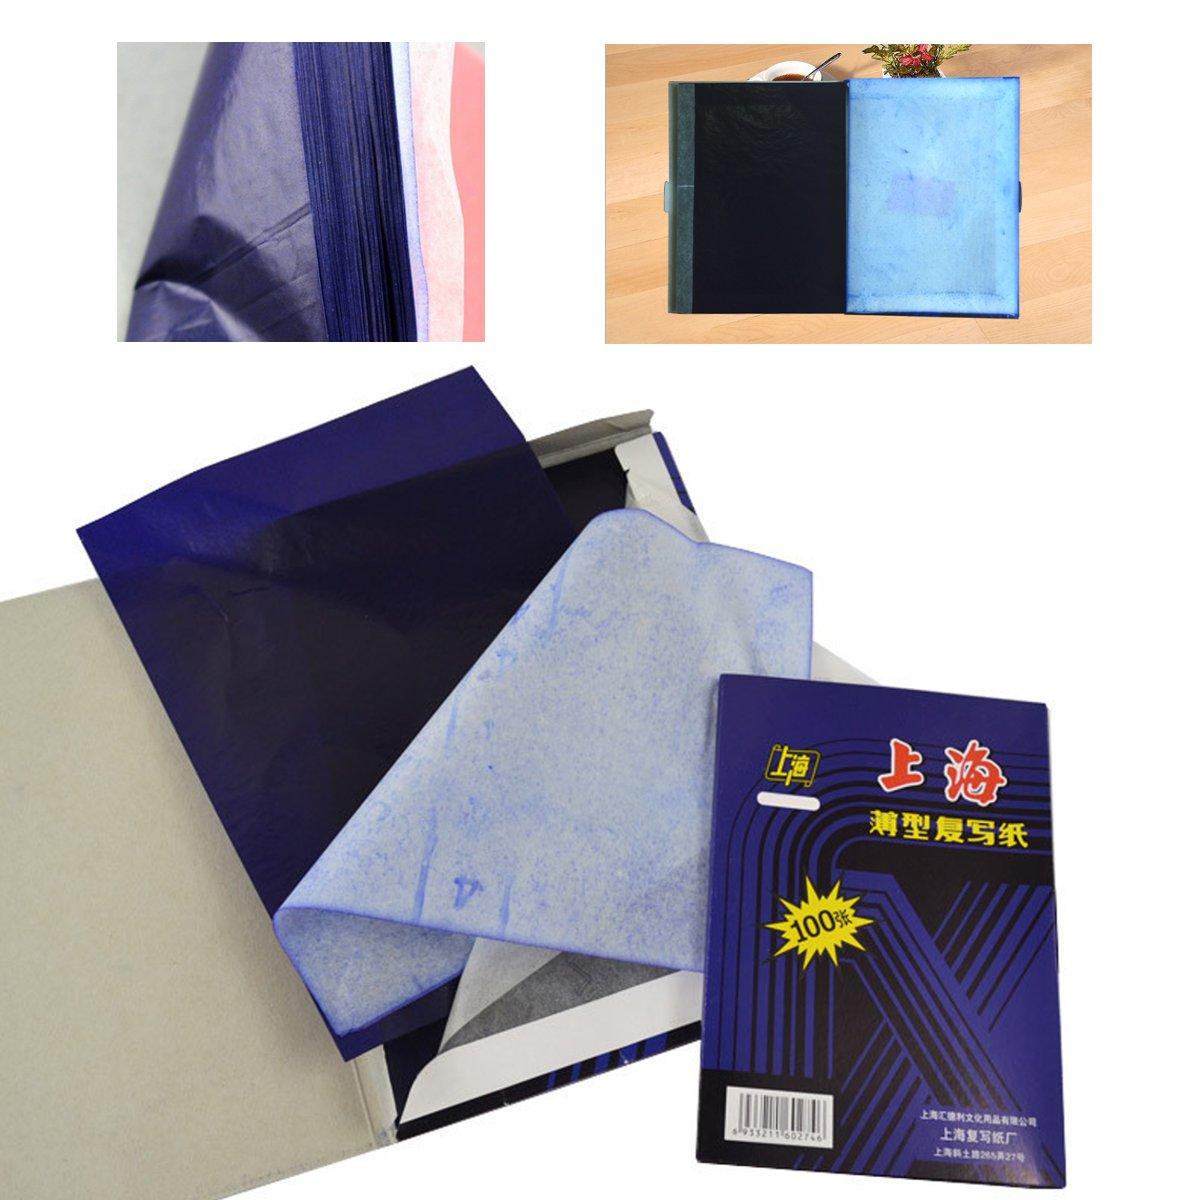 100 Sheets A4 Dark Blue Carbon Hand Copier Stencil Transfer Paper Hectograph Black Carbon Hand Copier Stencil Transfer Paper